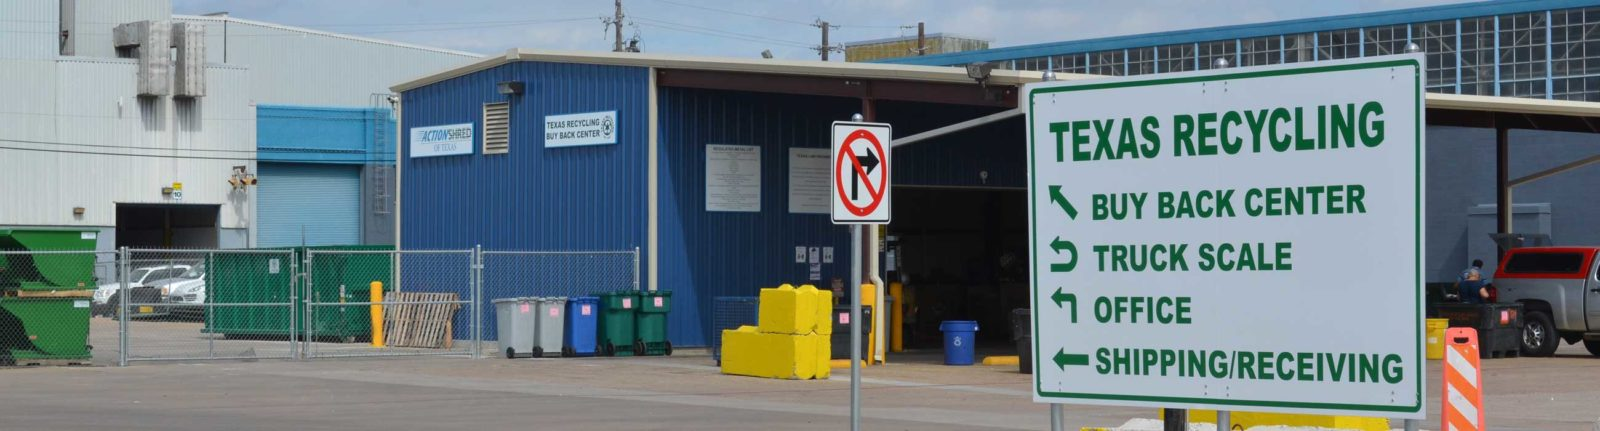 Metal-Recycling-Dallas_TxR-Slider-Buy-Back